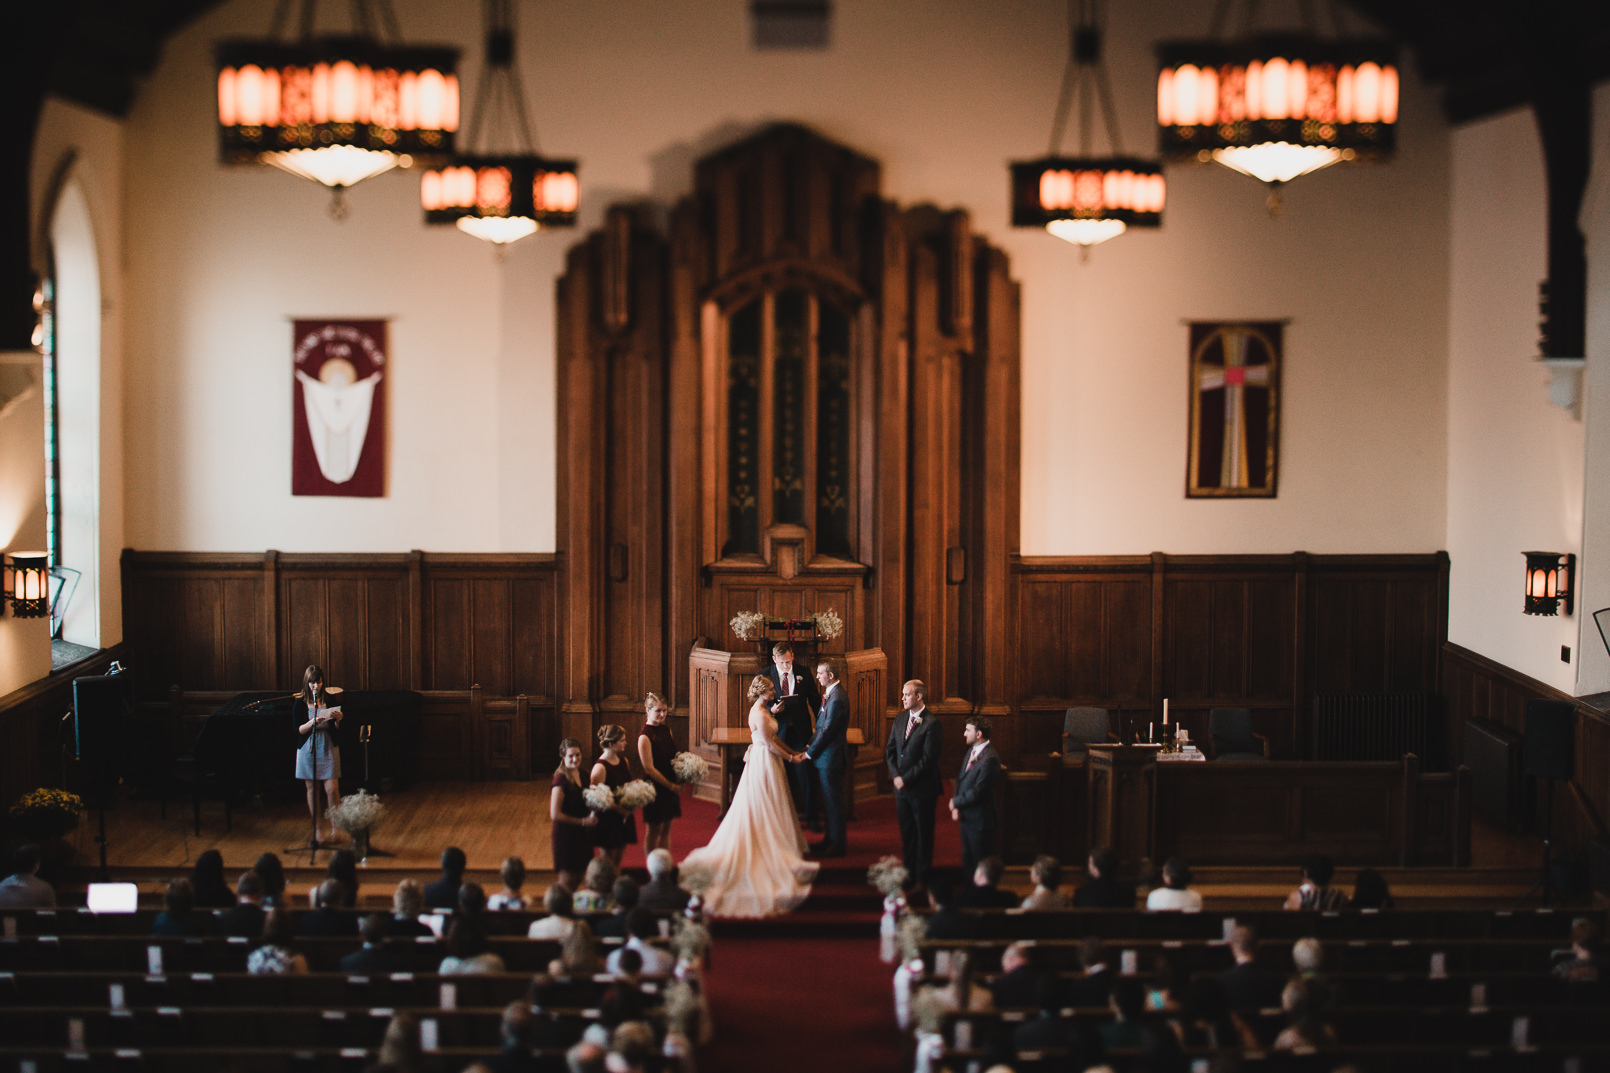 019-Jonathan-Kuhn-Photography-Wedding-_mini.jpg